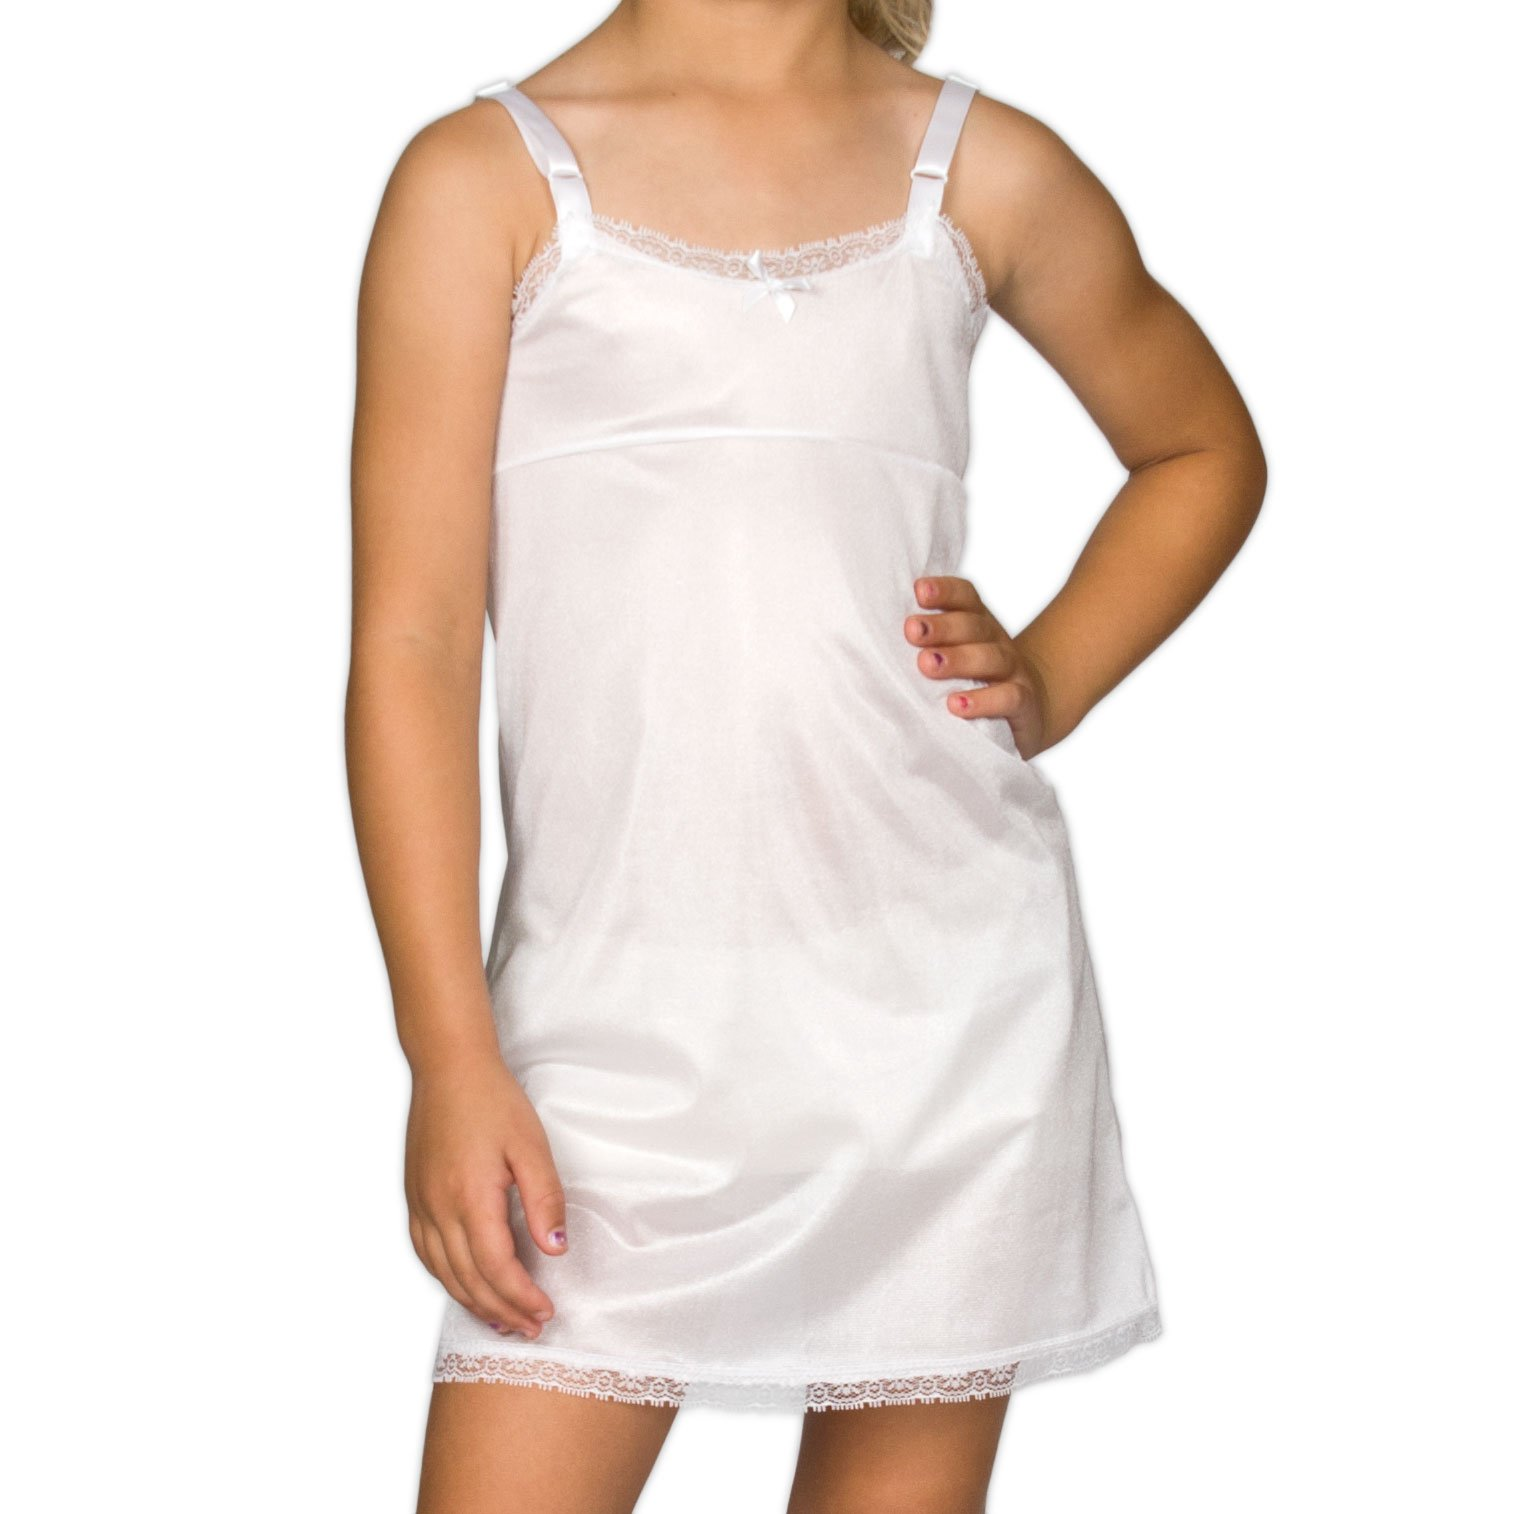 I.C. Collections Little Girls White Simple Empire Waist Slip, 4